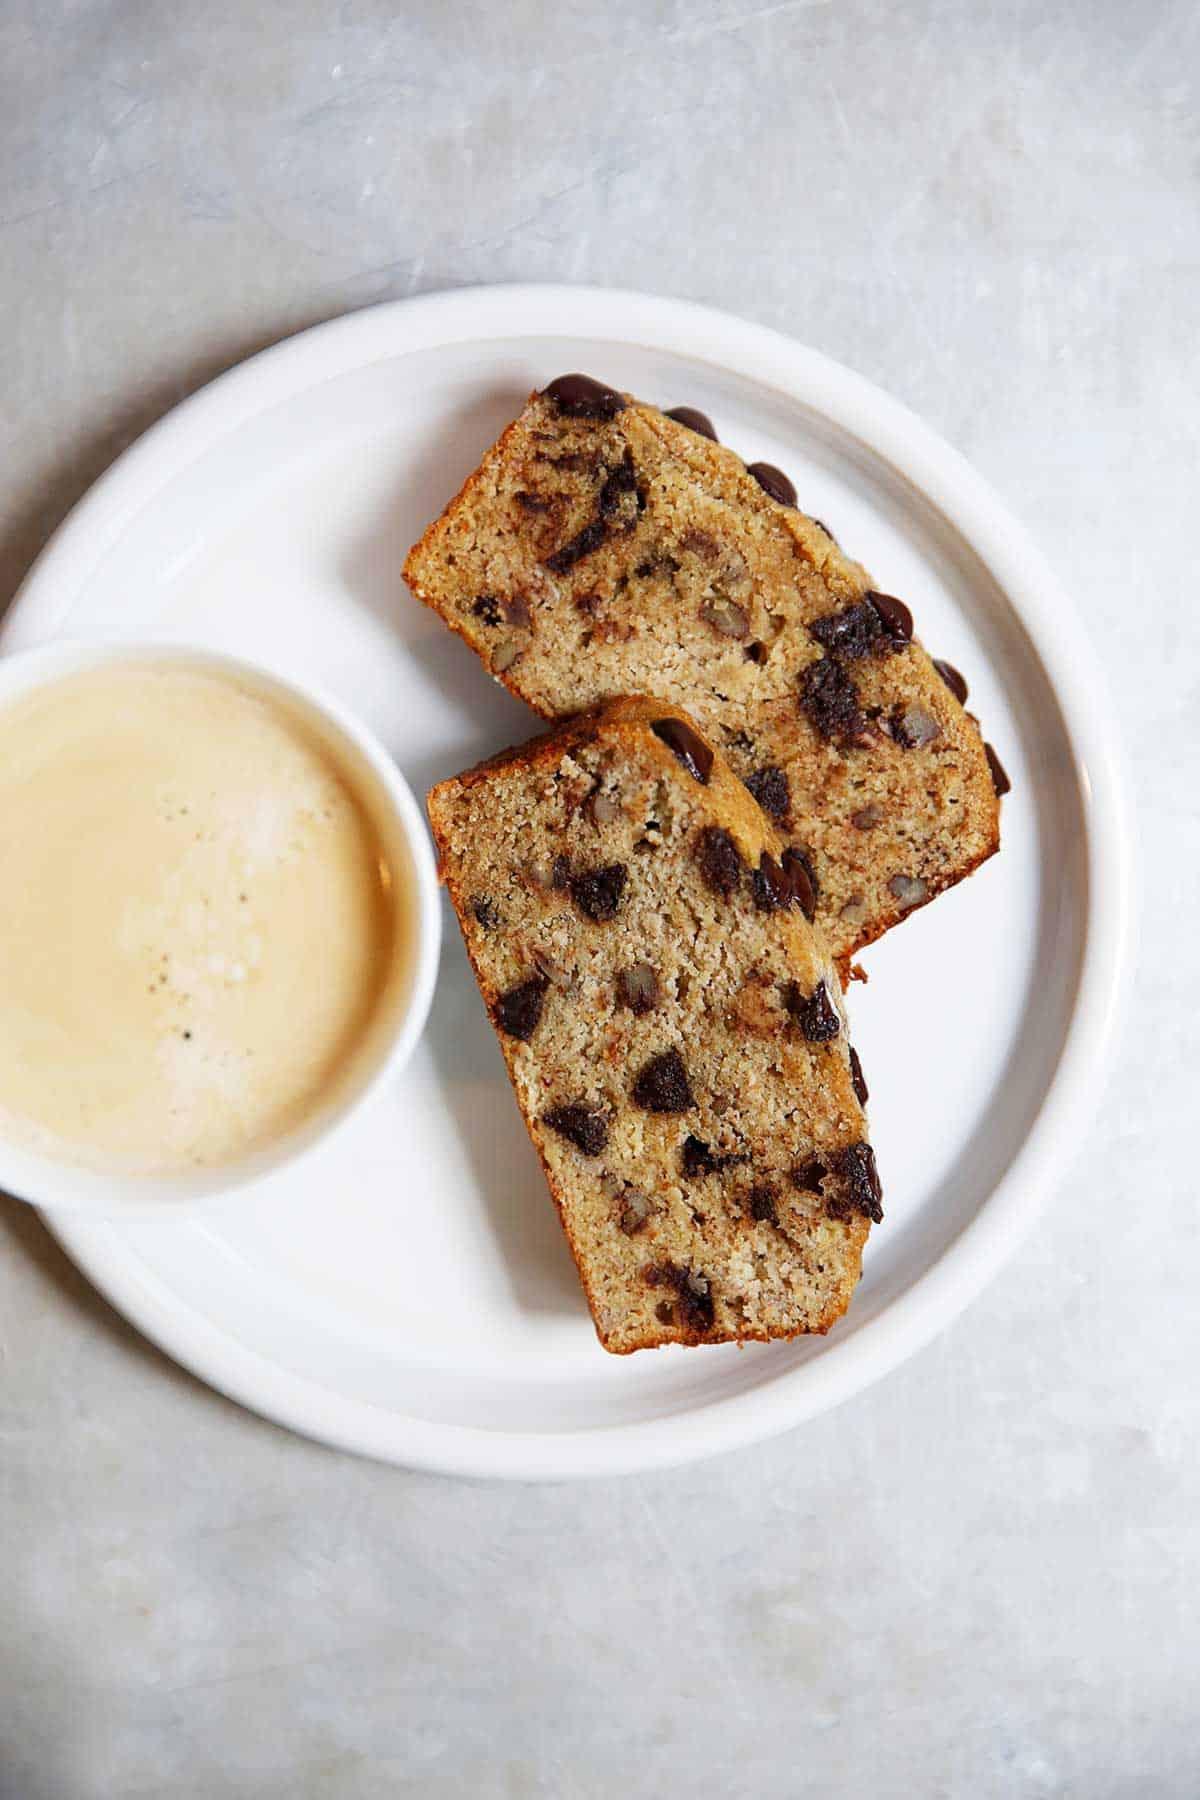 Paleo Brown Butter Banana Bread {Gluten-free, grain-free} | Lexi's Clean Kitchen